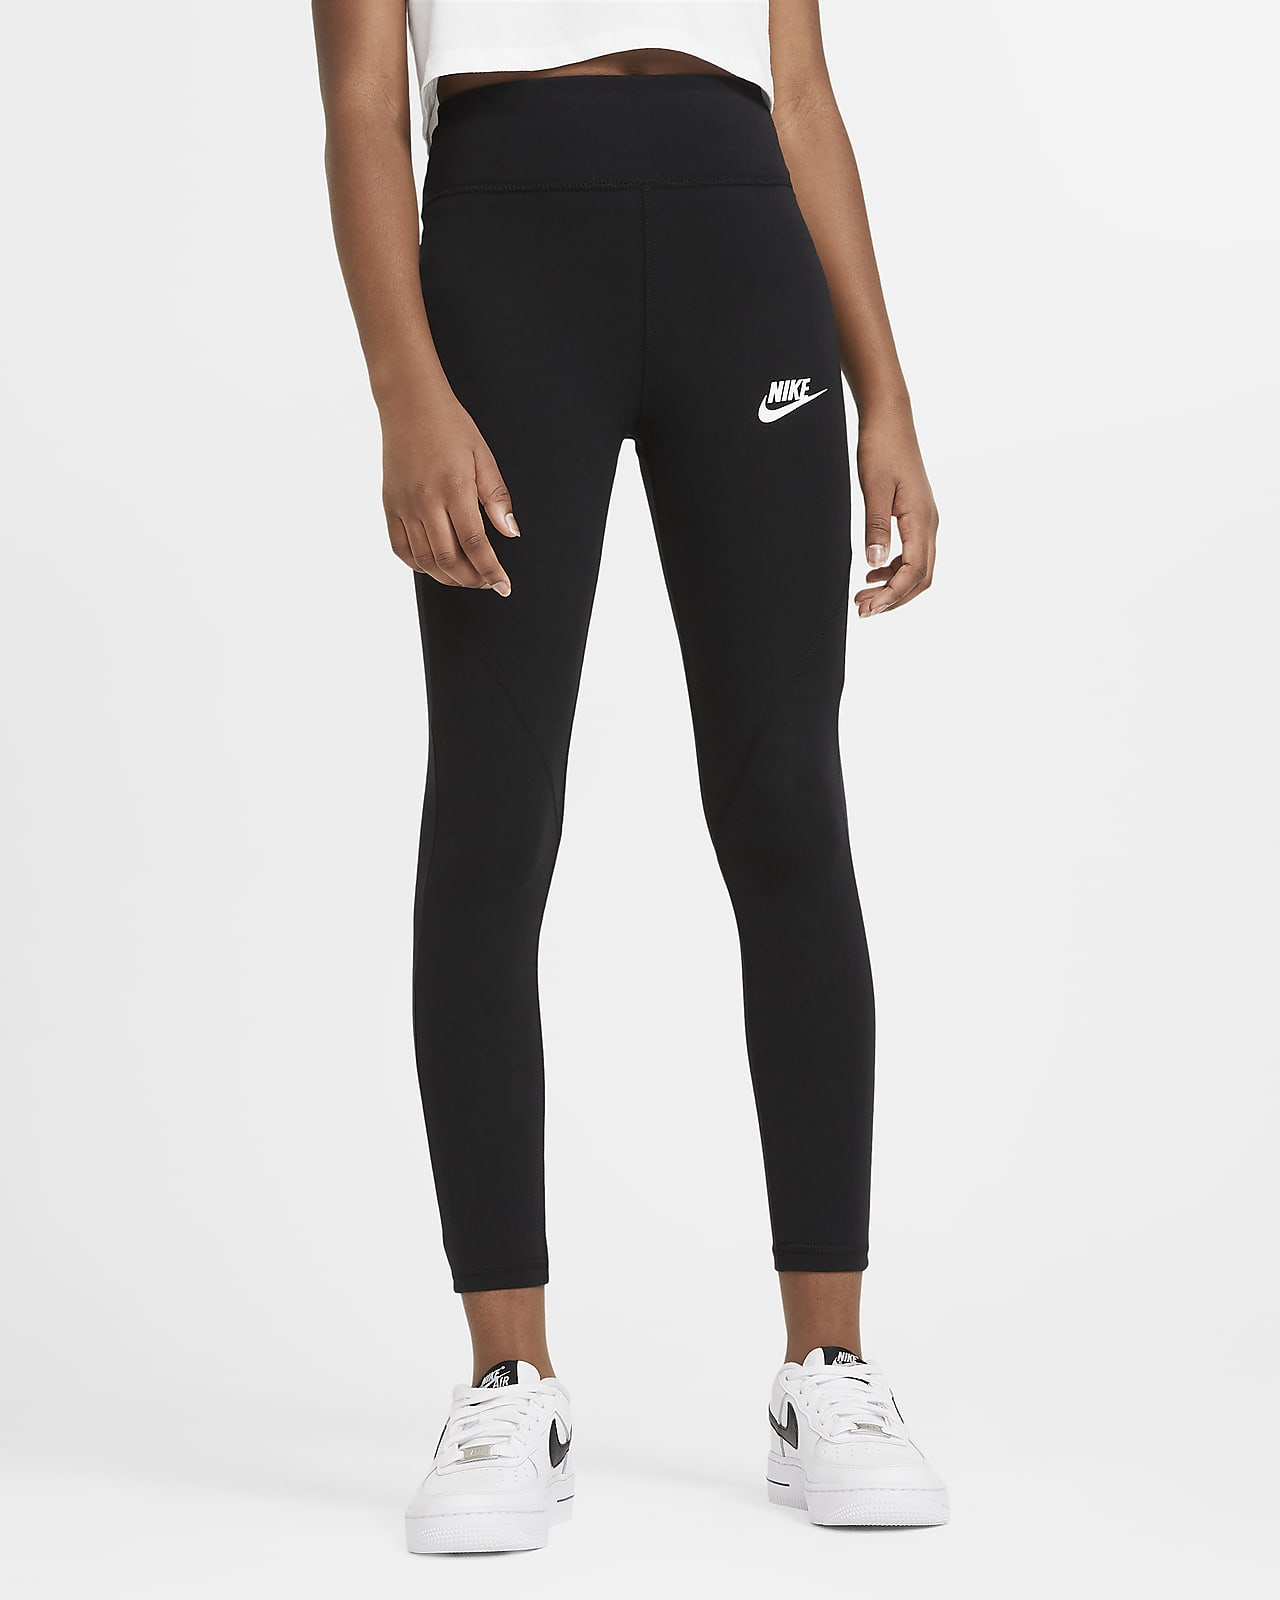 Legging taille haute Nike Sportswear Favorites pour Fille plus âgée